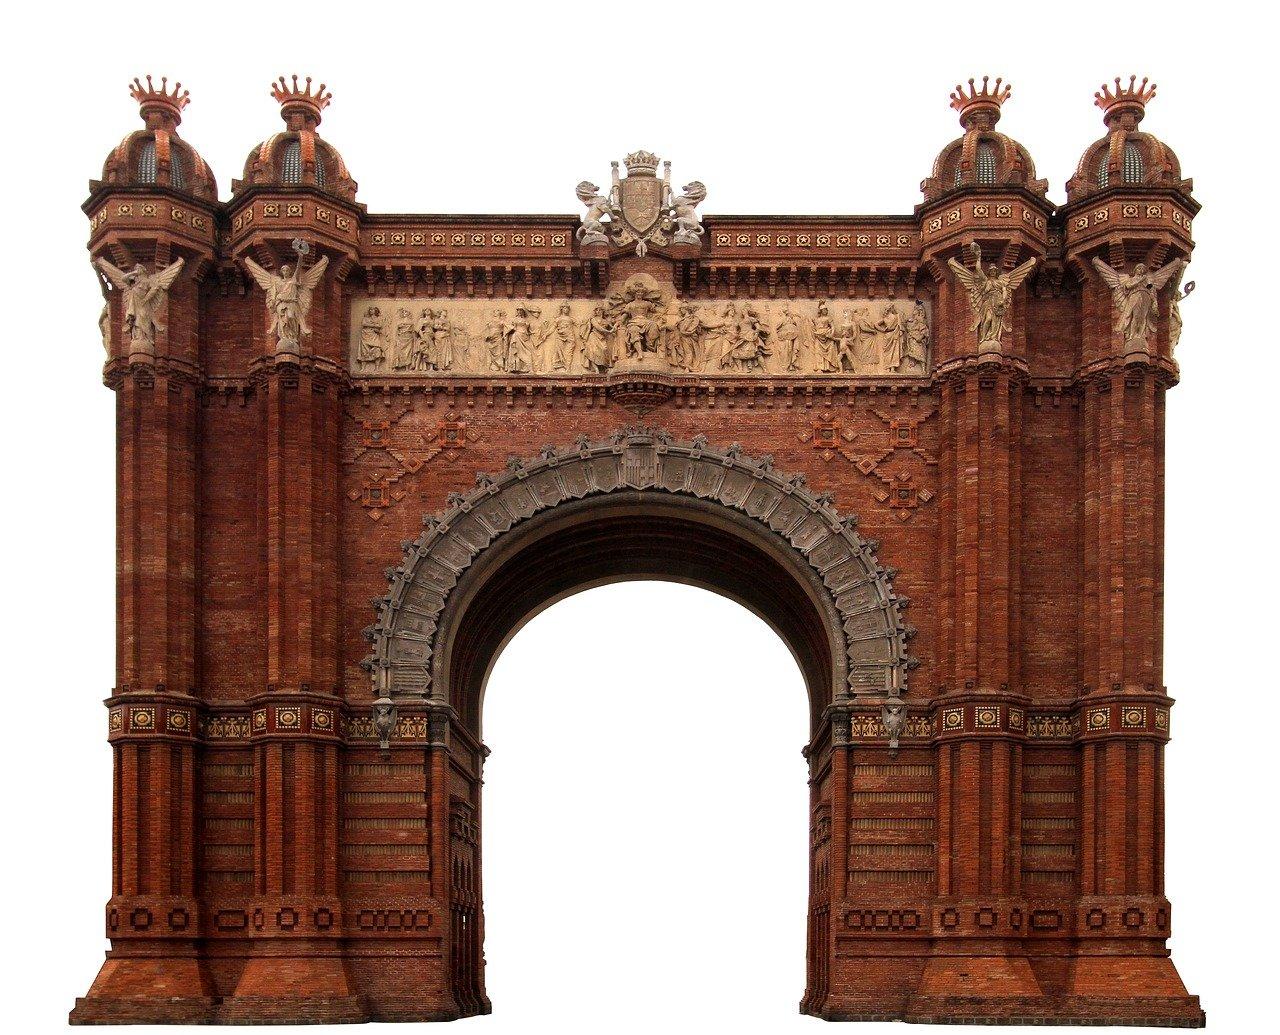 edificio, arc de triomphe, barcelona